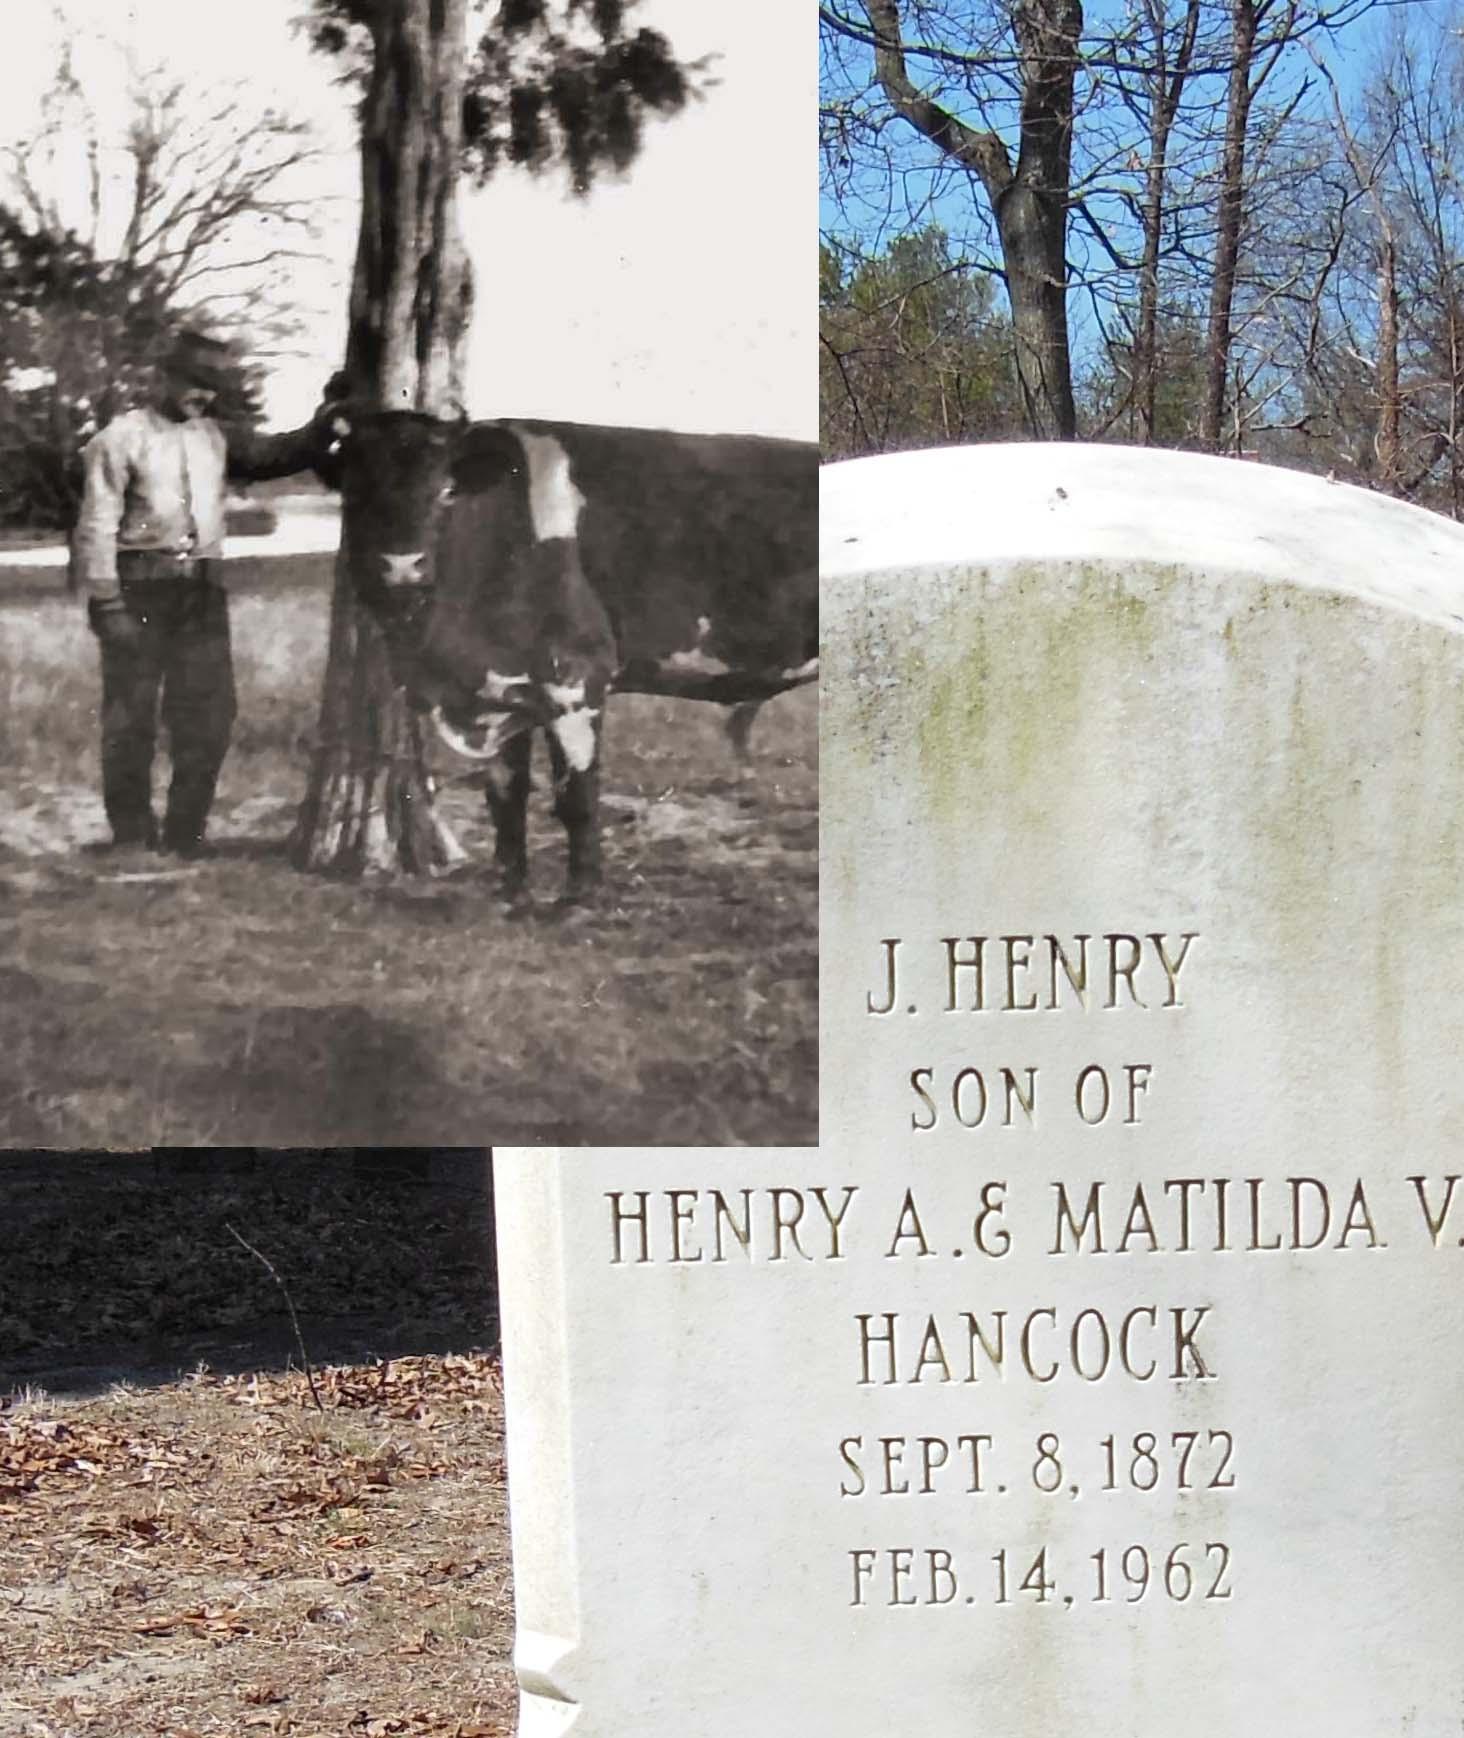 Hancock Family and Grave Yard